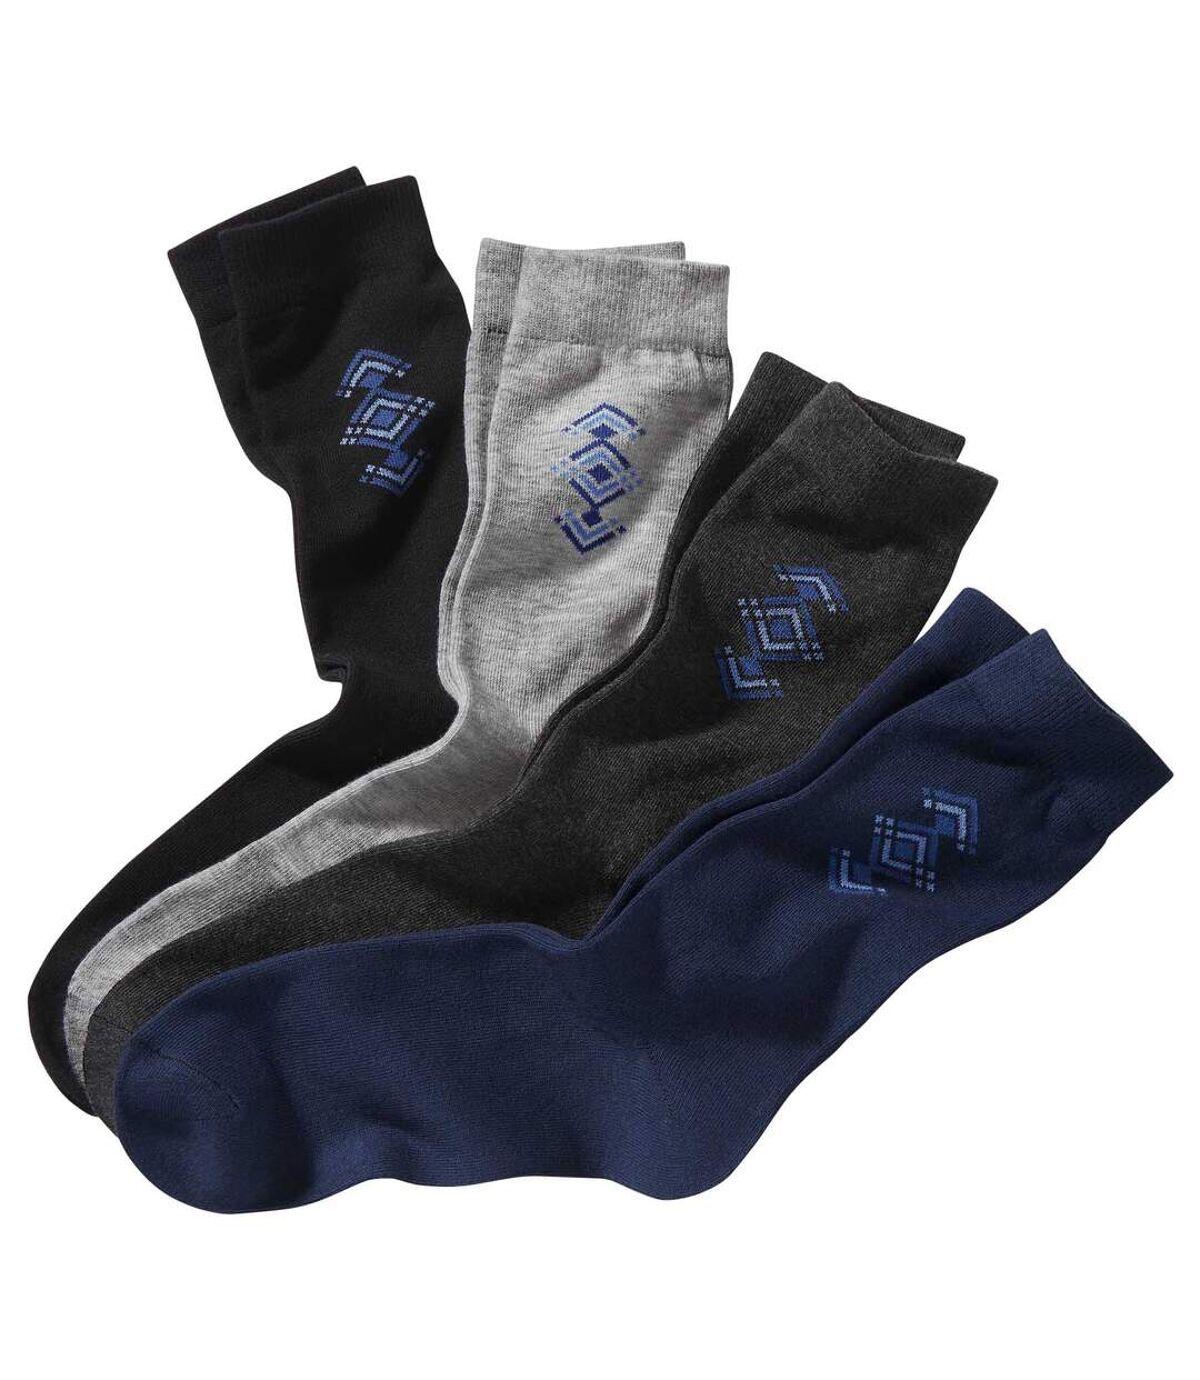 Sada 4 párů ponožek s barevným vzorováním Atlas For Men